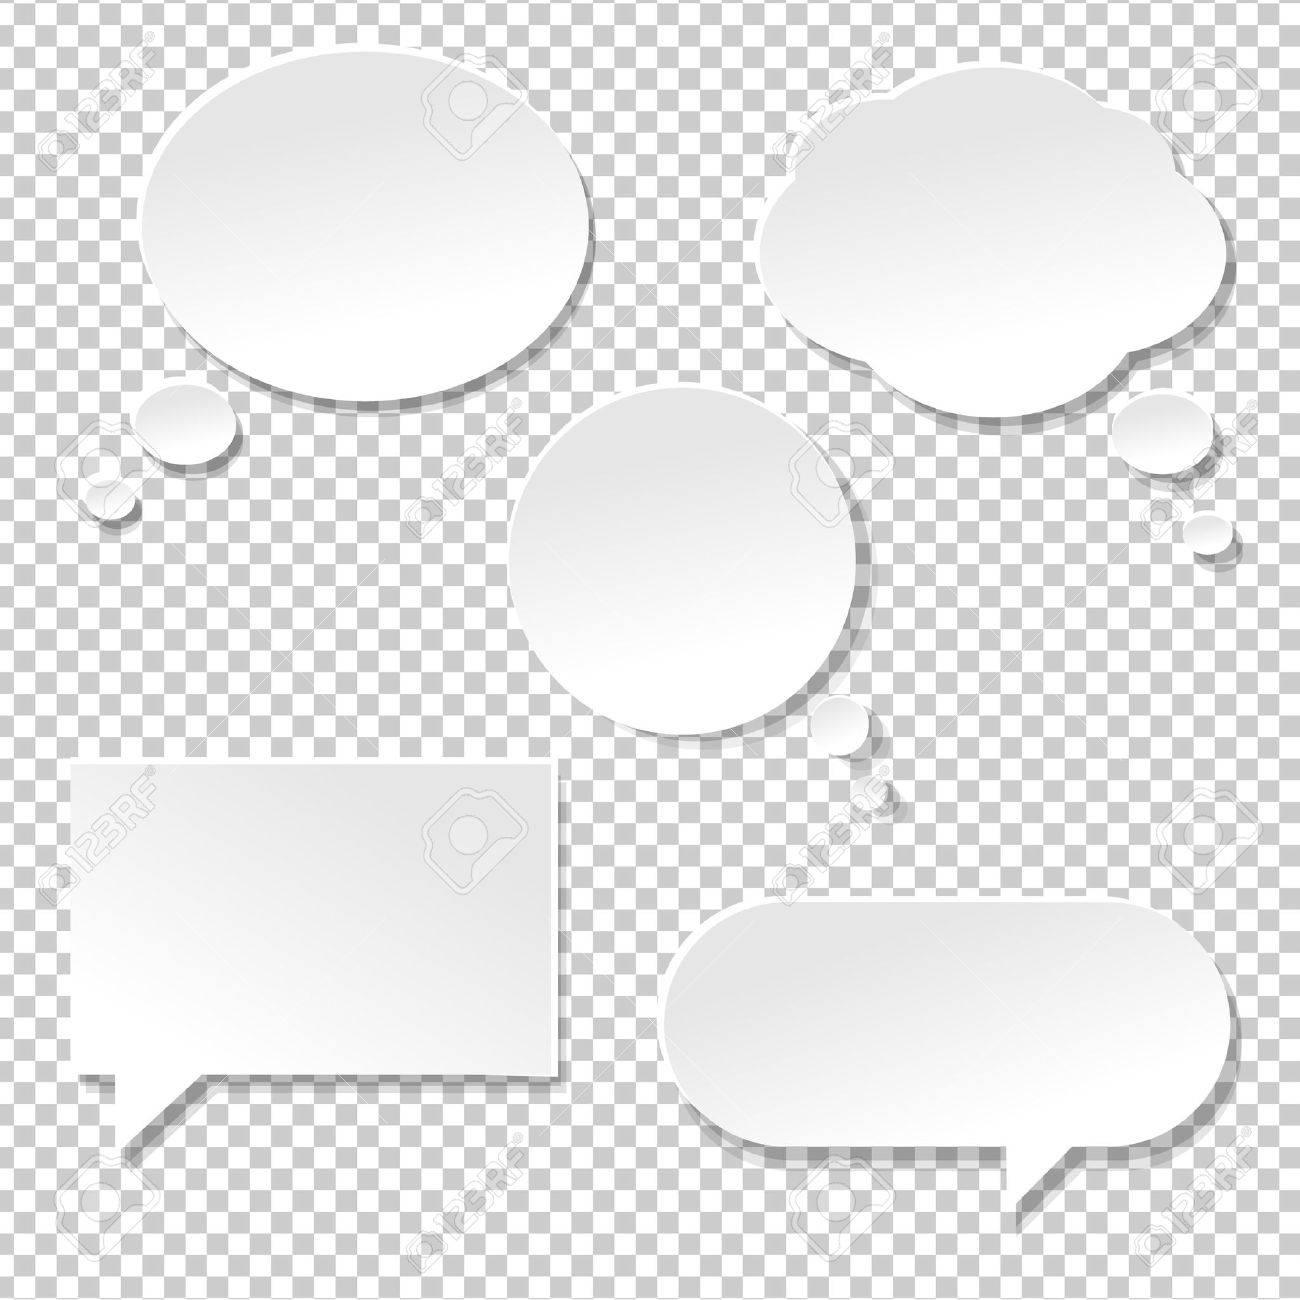 Speech Bubble Big Set, Isolated on Transparent Background, Vector Illustration - 55086608